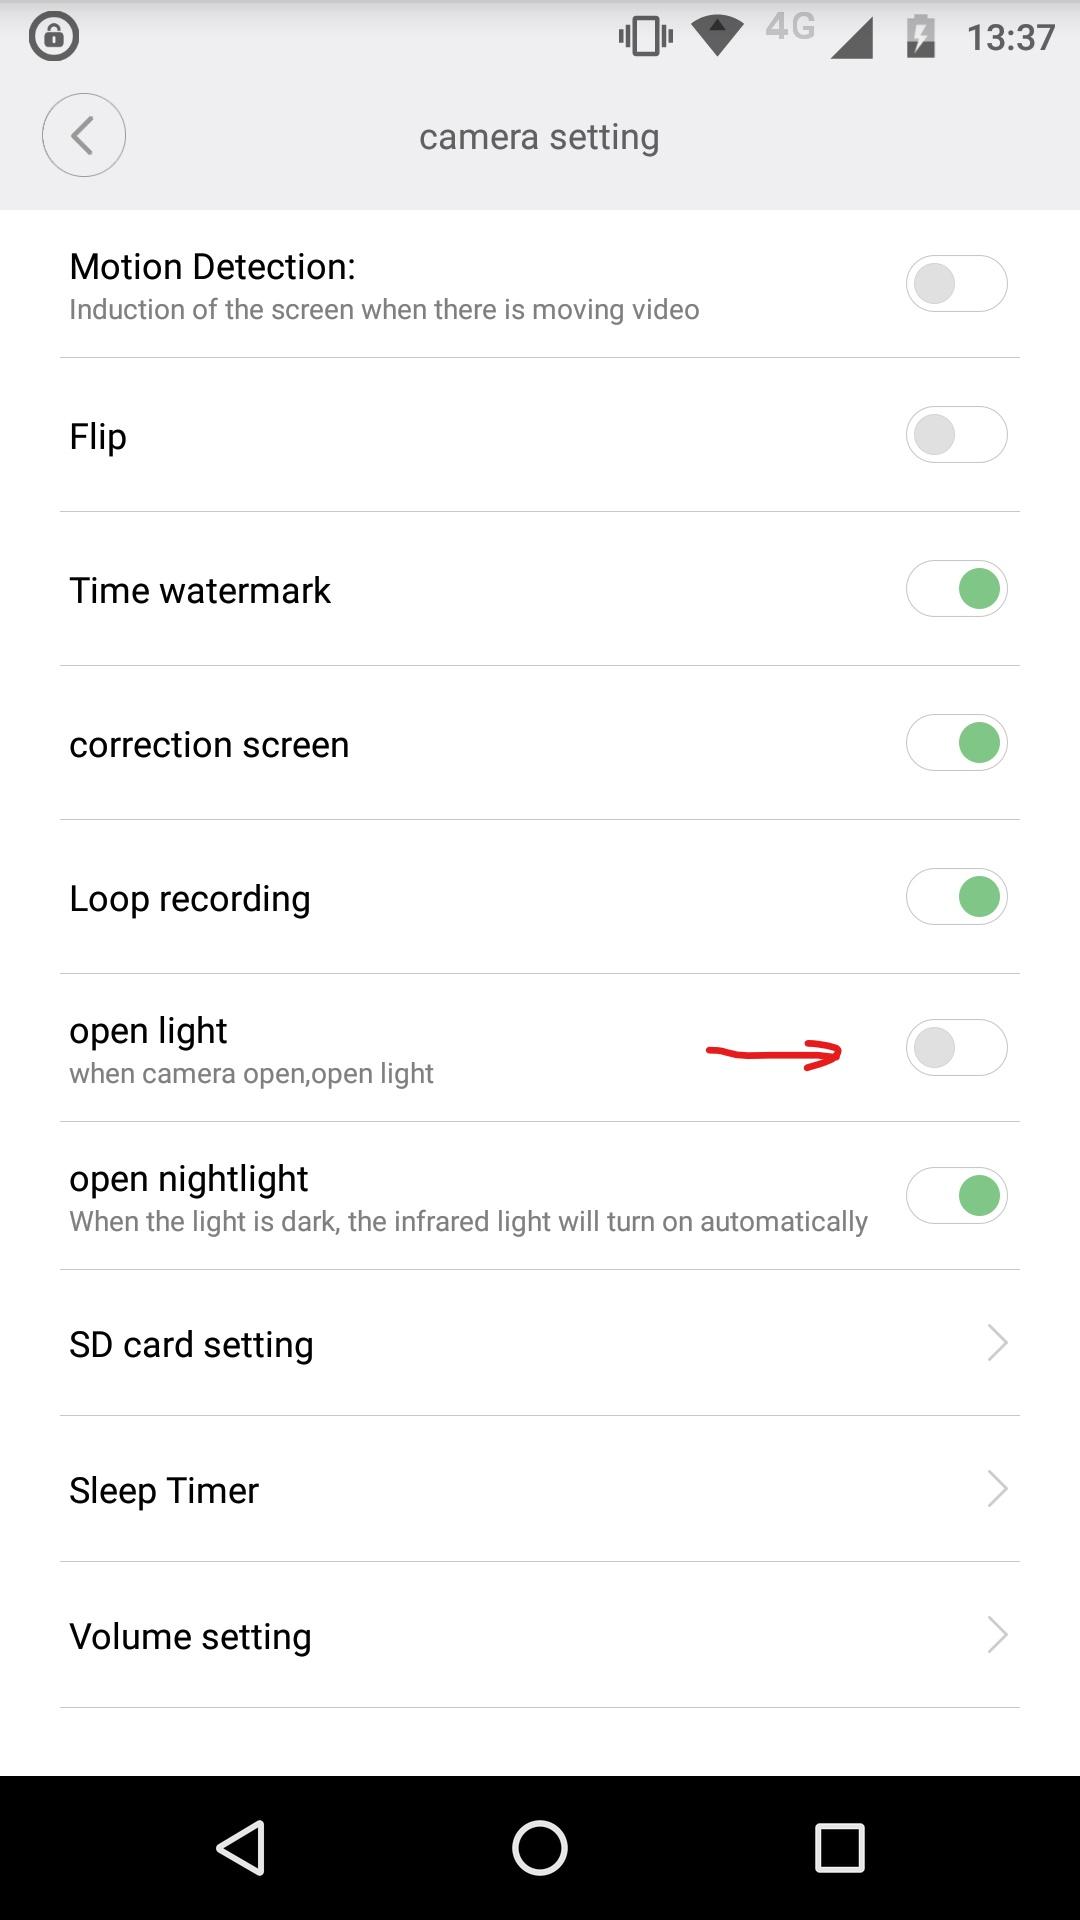 Xiaomi Mijia Aqara Smart Ip Camera - Connection Timed Out | Xiaomi